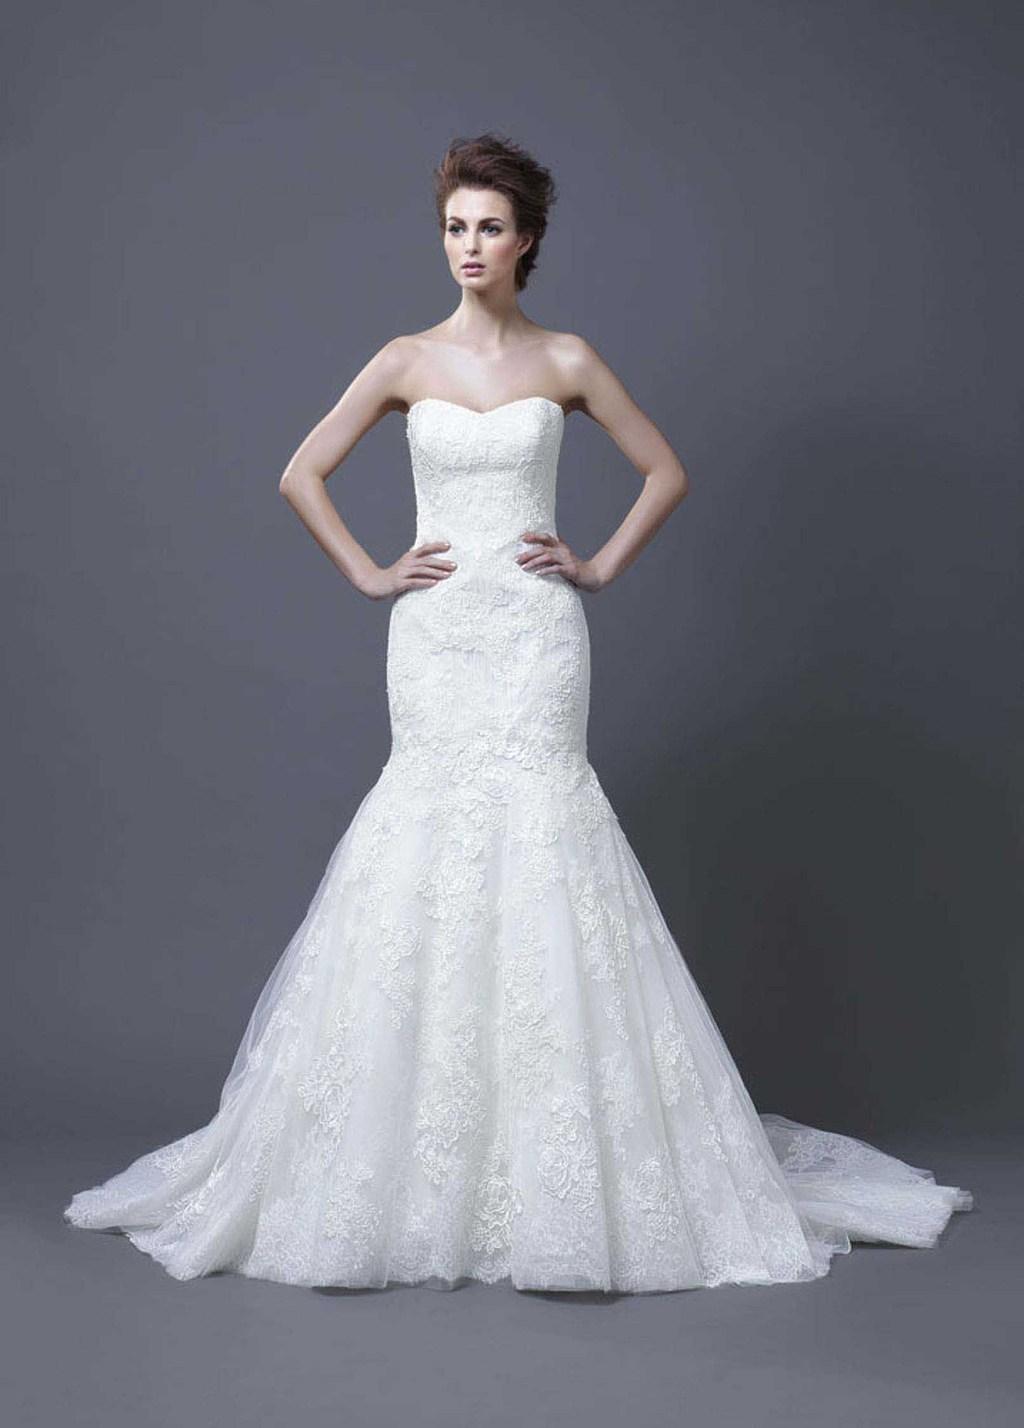 2013-wedding-dress-by-enzoani-bridal-halima.full